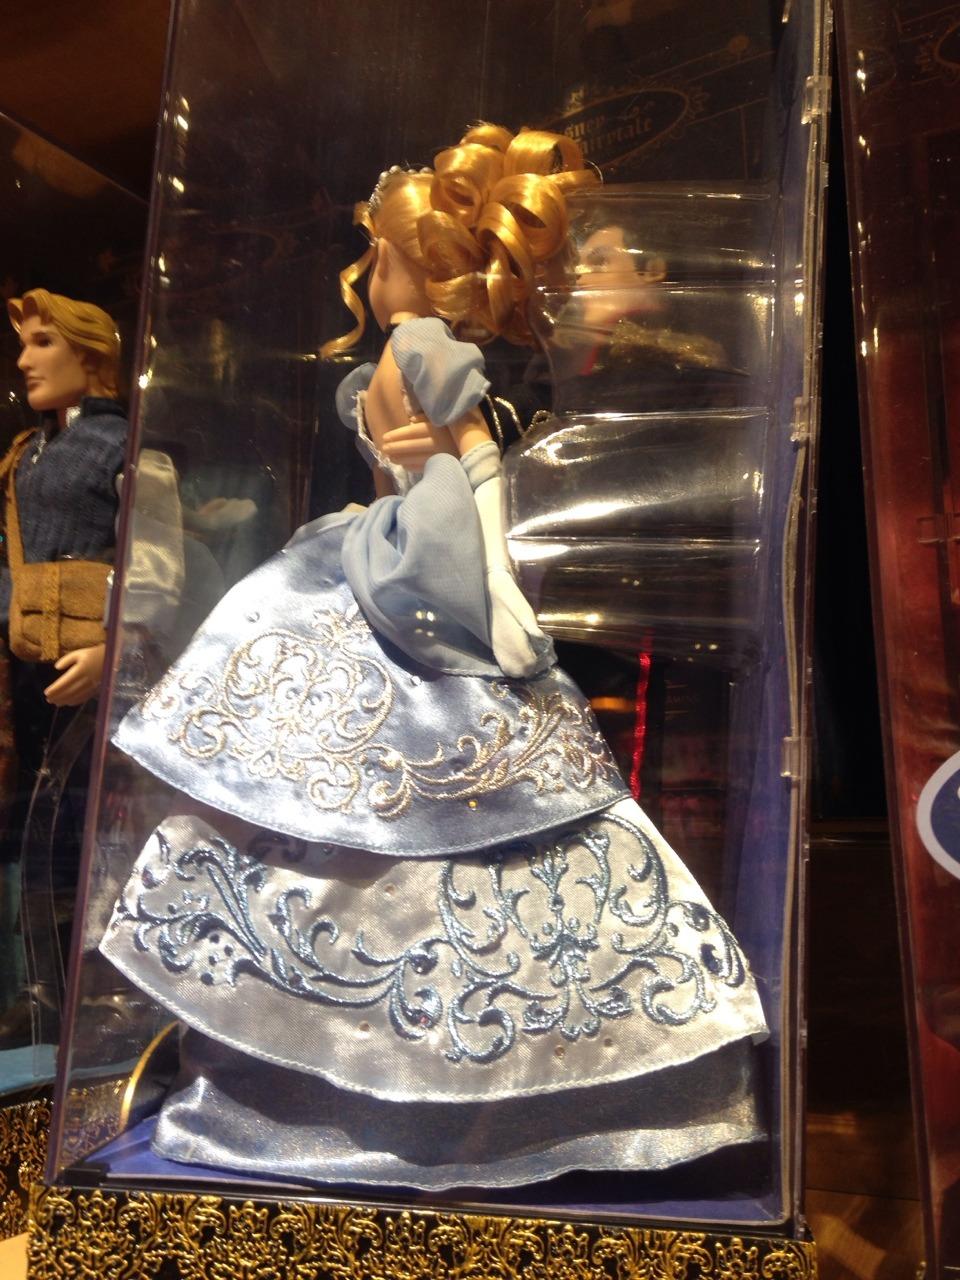 Disney Fairytale Designer Collection (depuis 2013) - Page 20 Tumblr_nbchtxddVO1rn0wm6o2_1280